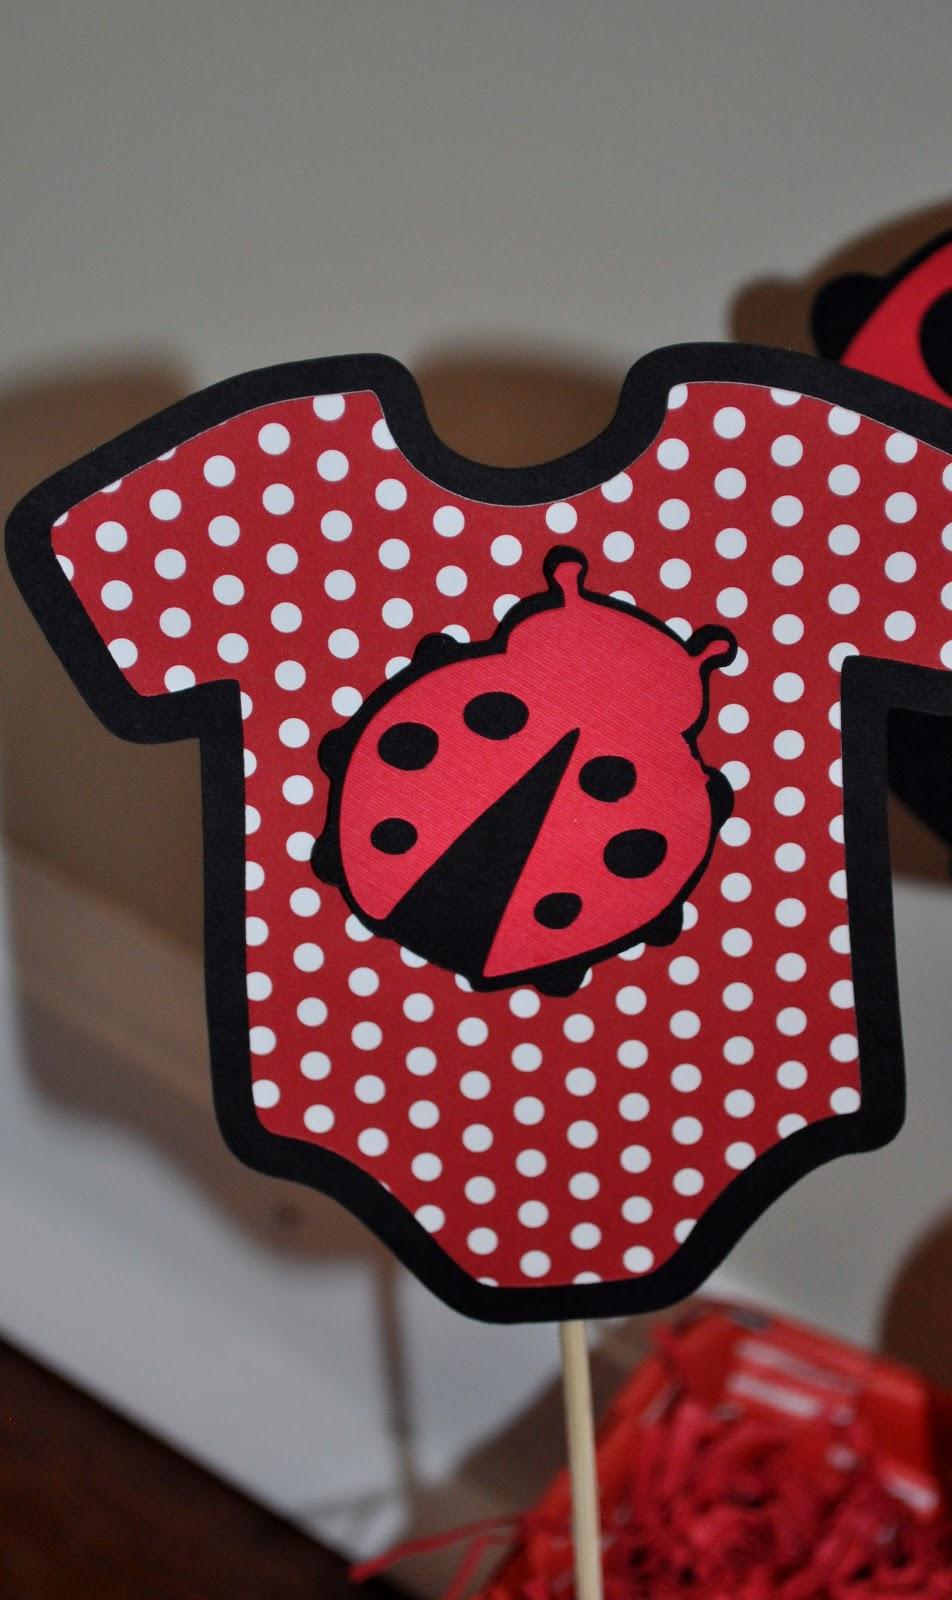 creations ladybug baby shower centerpiece